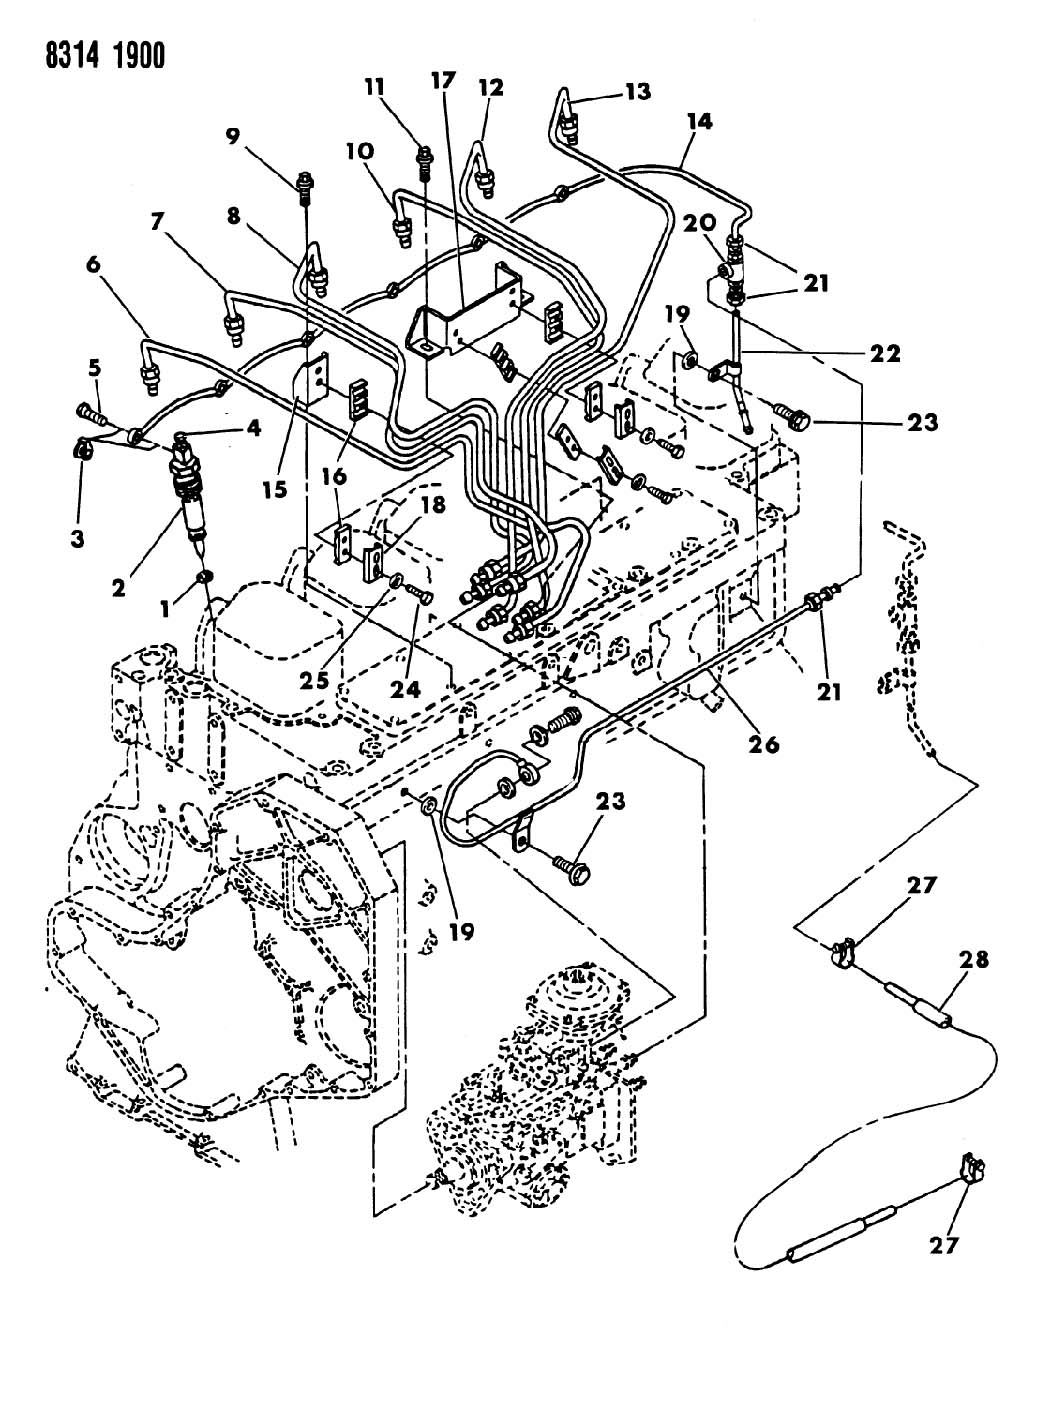 Magnificent jeep cj7 fuse box diagram vig te wiring diagram